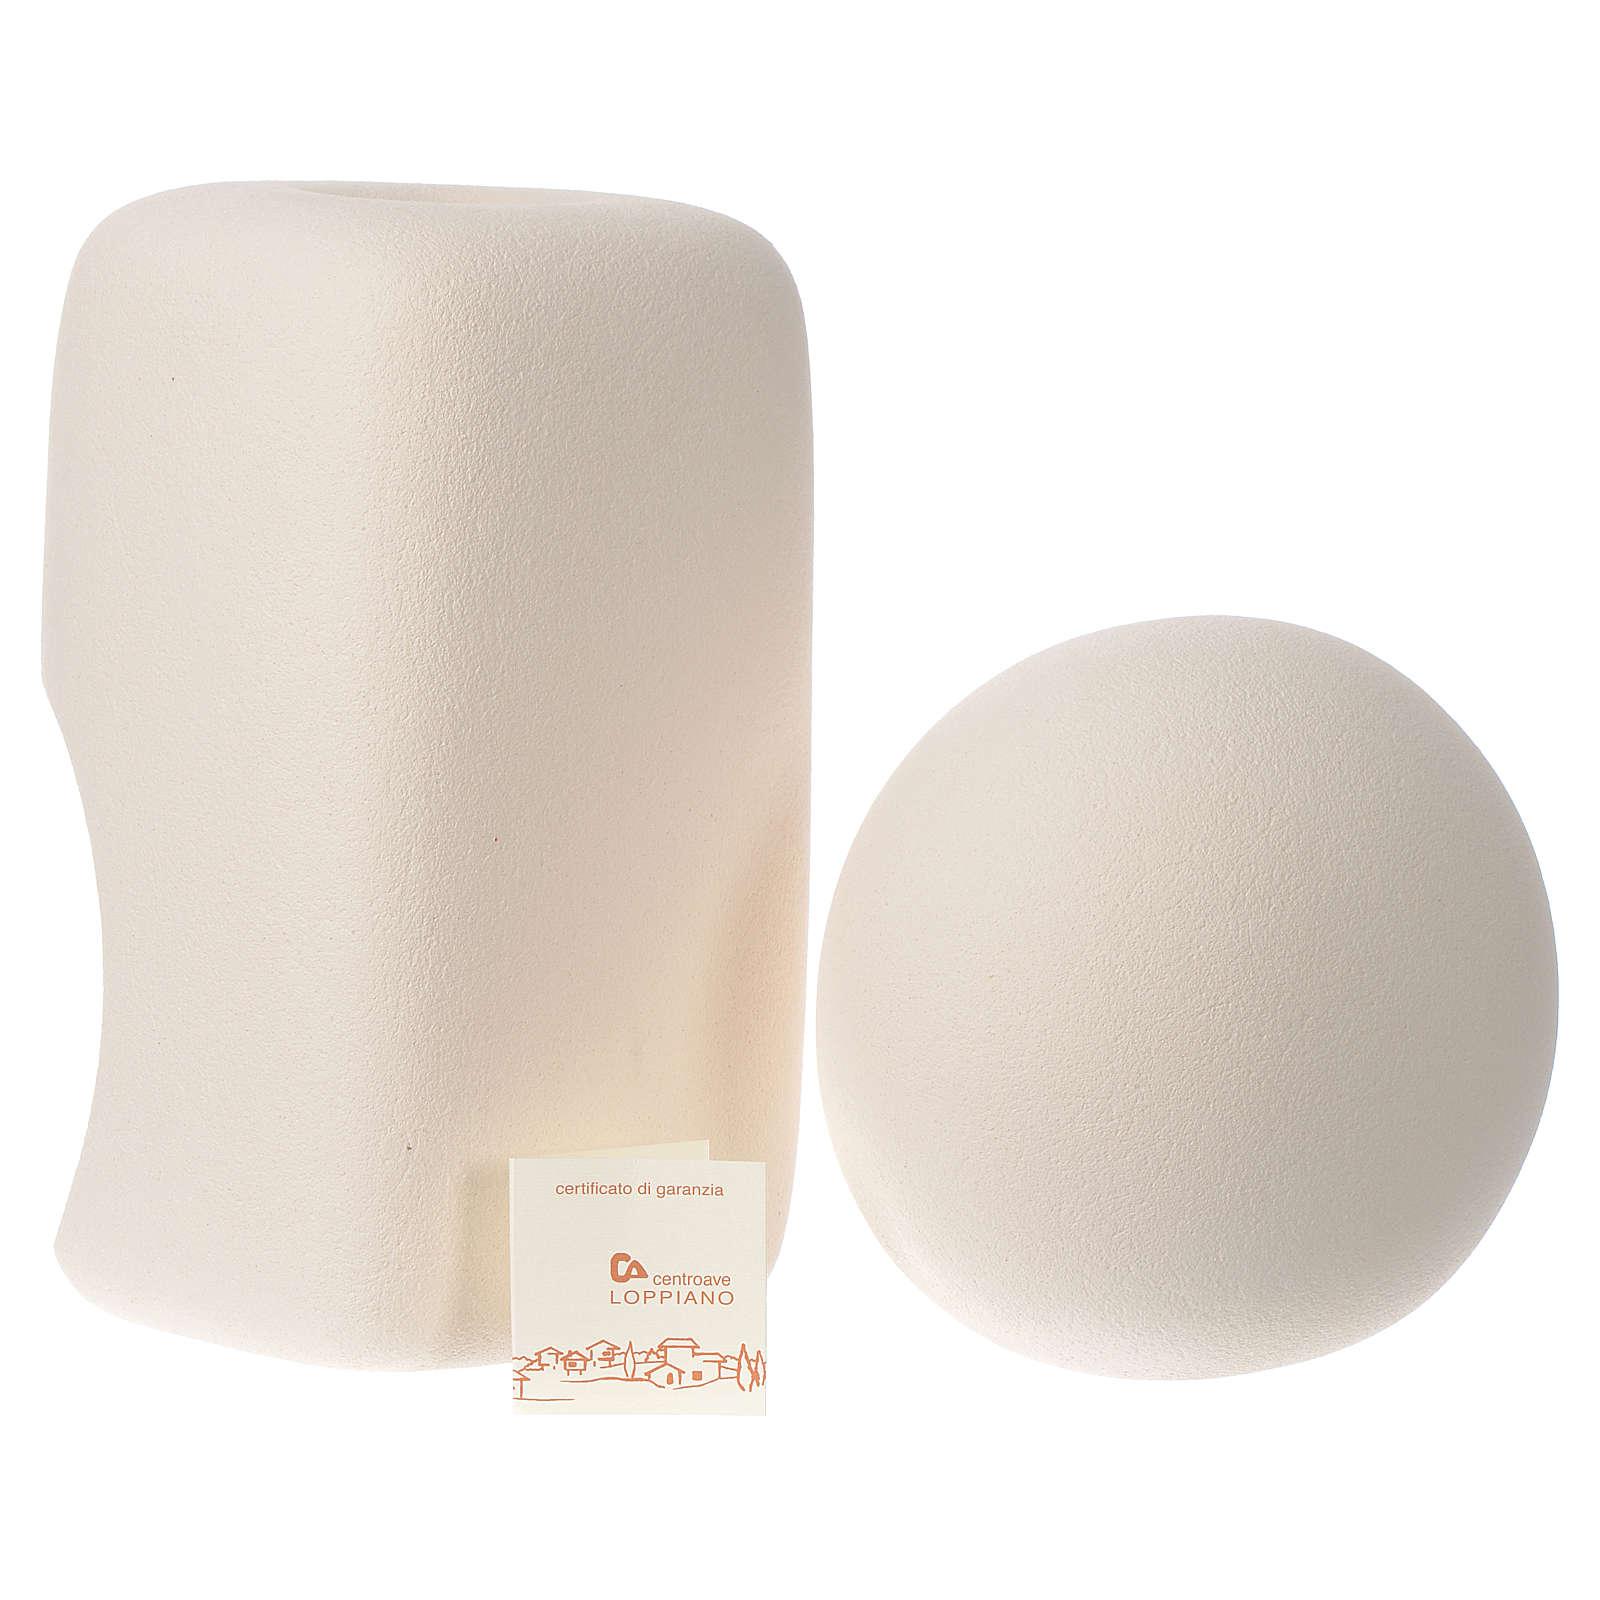 Accordo grande Ceramica Centro Ave 24 cm 3